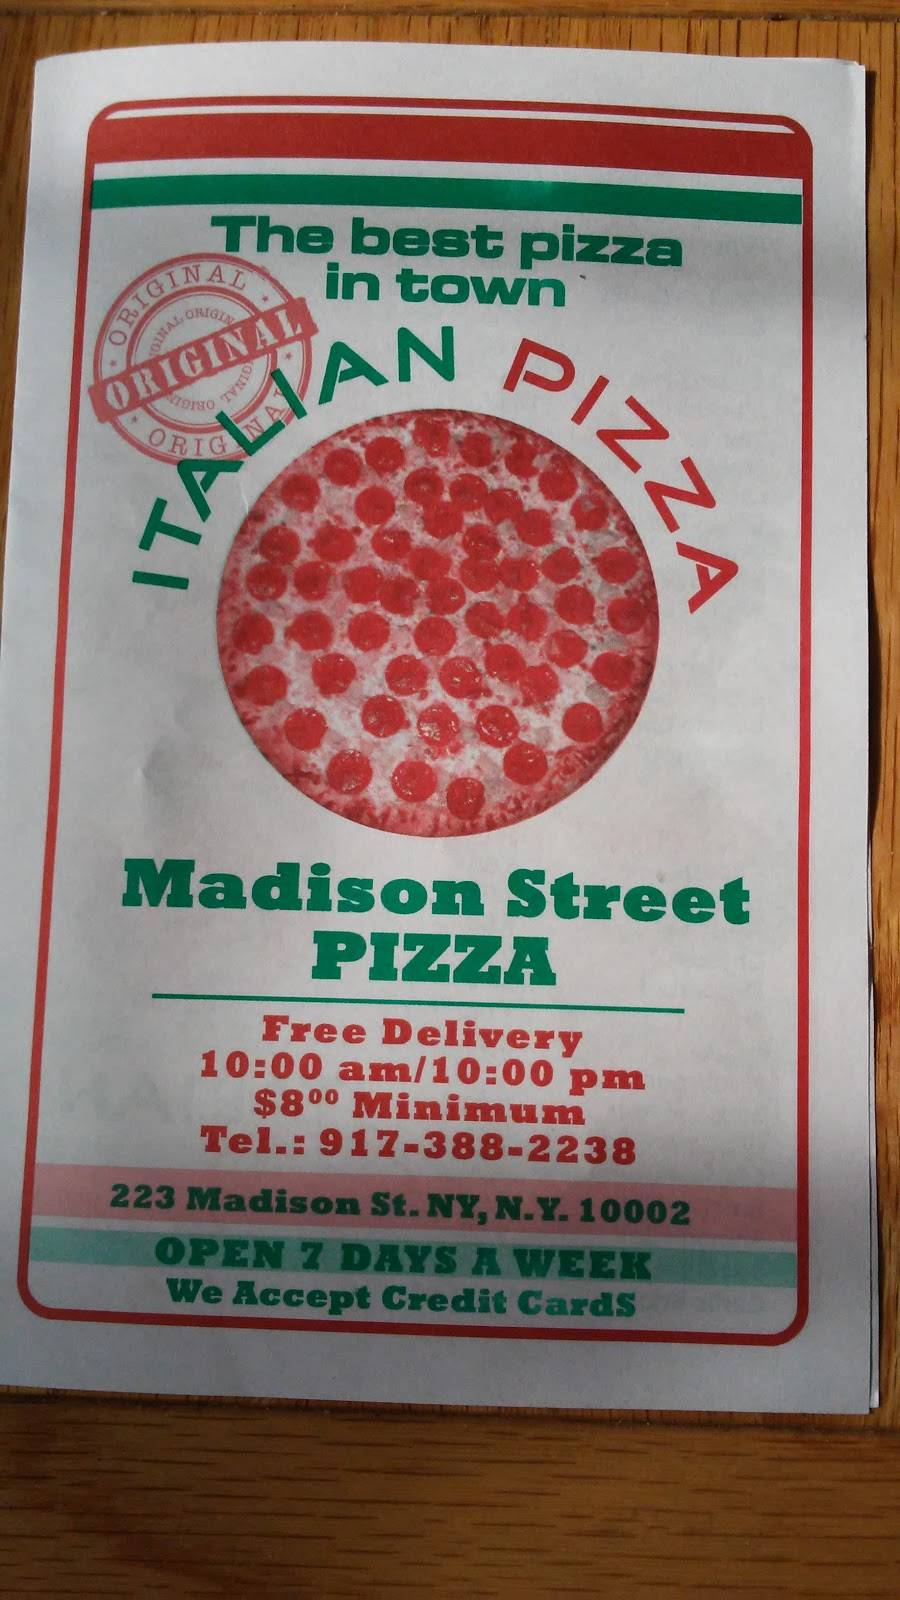 Madison Street Pizza   restaurant   223 Madison St, New York, NY 10002, USA   9173882238 OR +1 917-388-2238